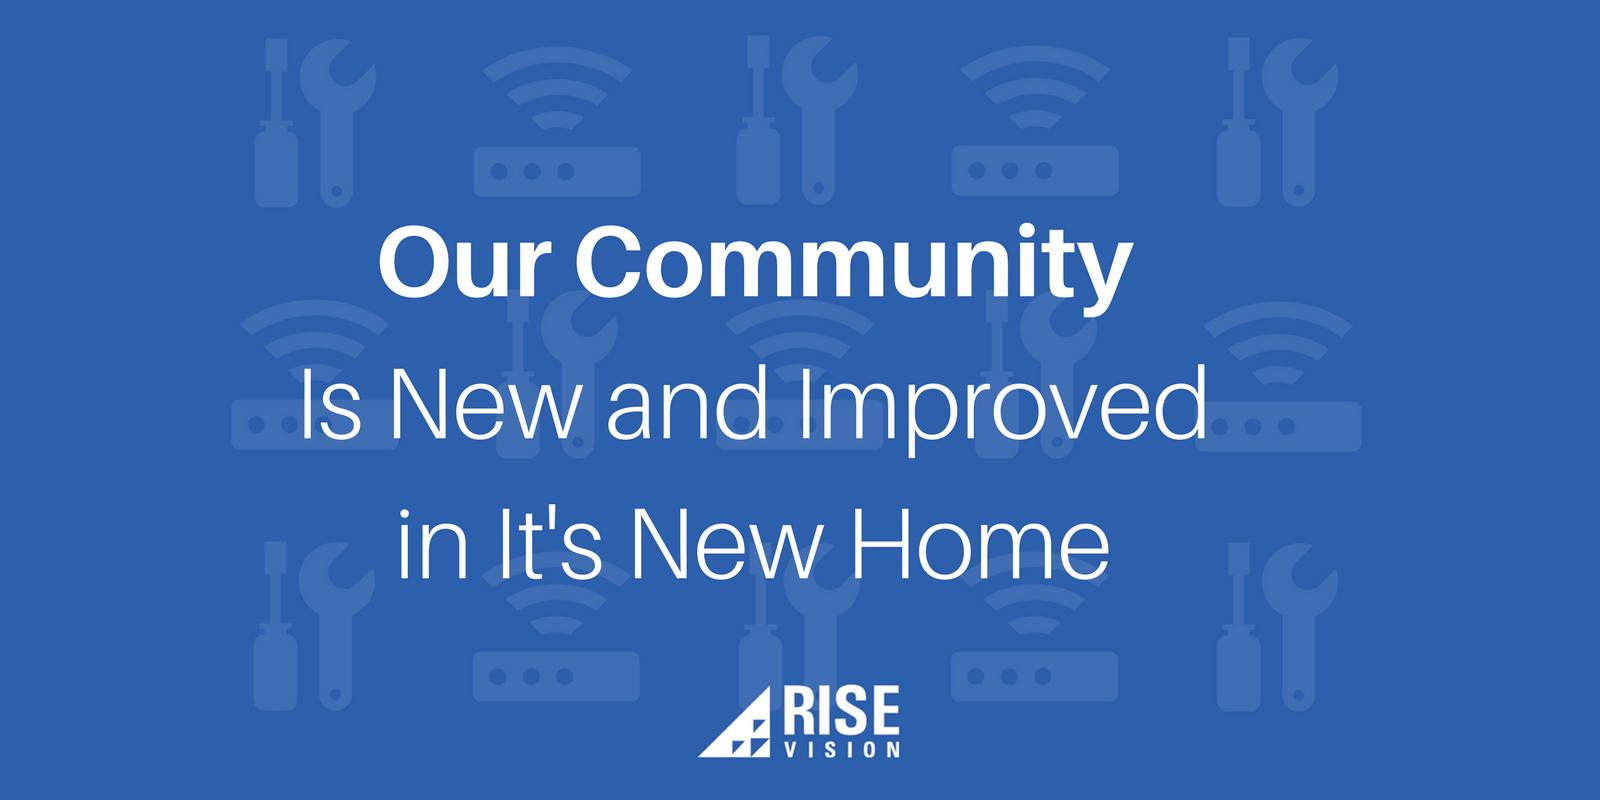 Rise Vision Digital Signage Community.png